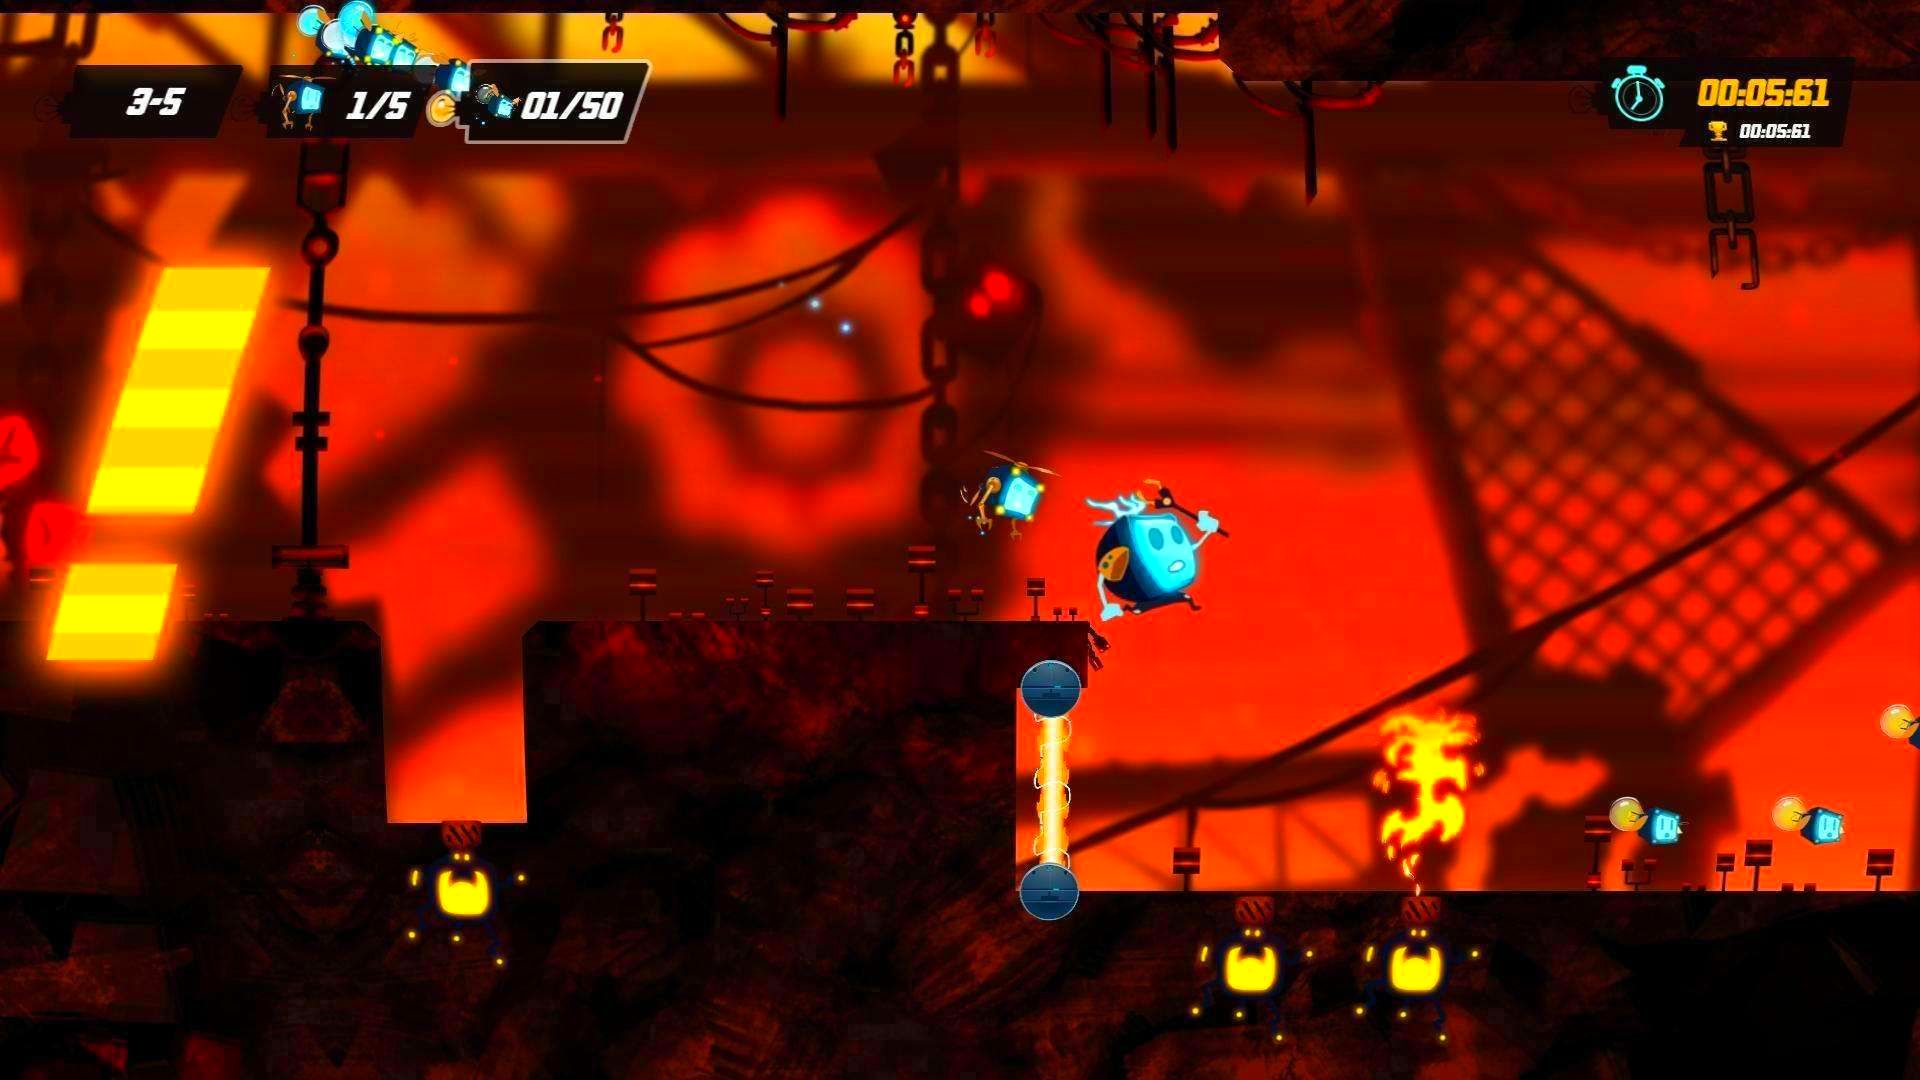 Screenshot from Mechanic Escape (3/5)